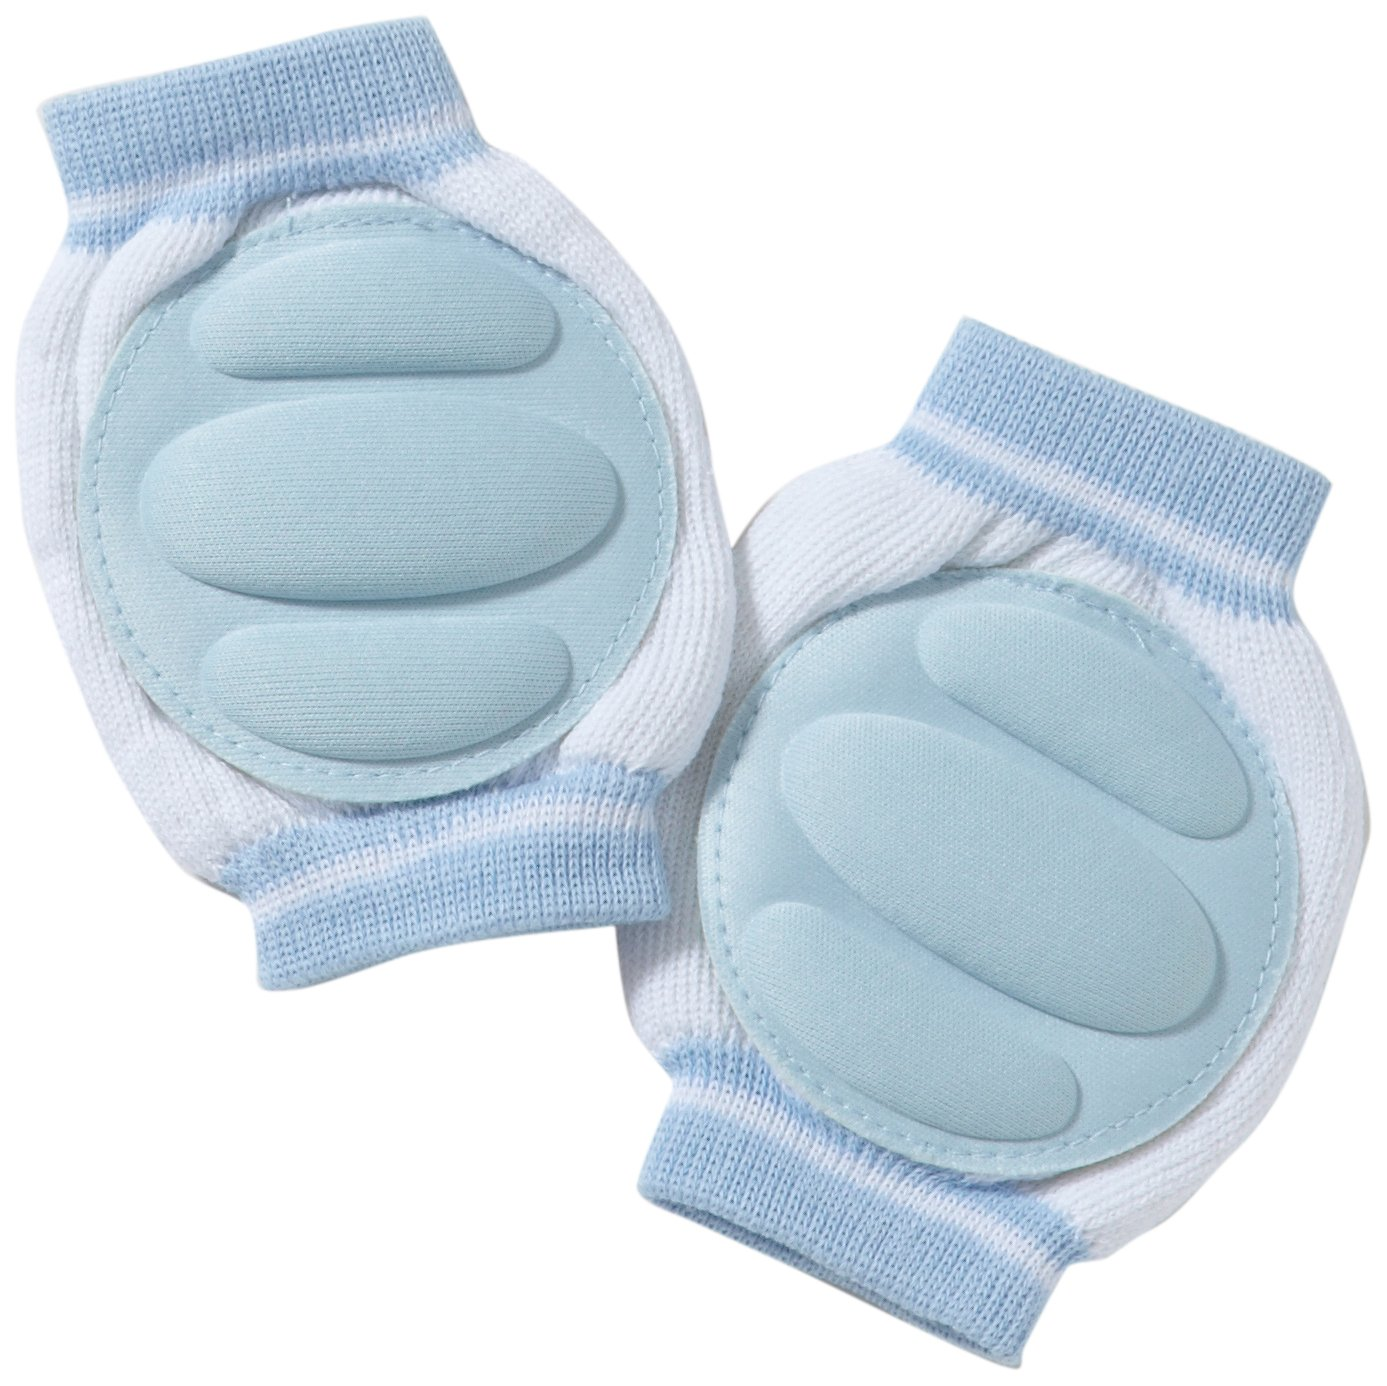 Playshoes Unisex - Baby Set 498801 Knieschoner Gr. one size Mehrfarbig (hellblau) Playshoes GmbH 498801 von Playshoes